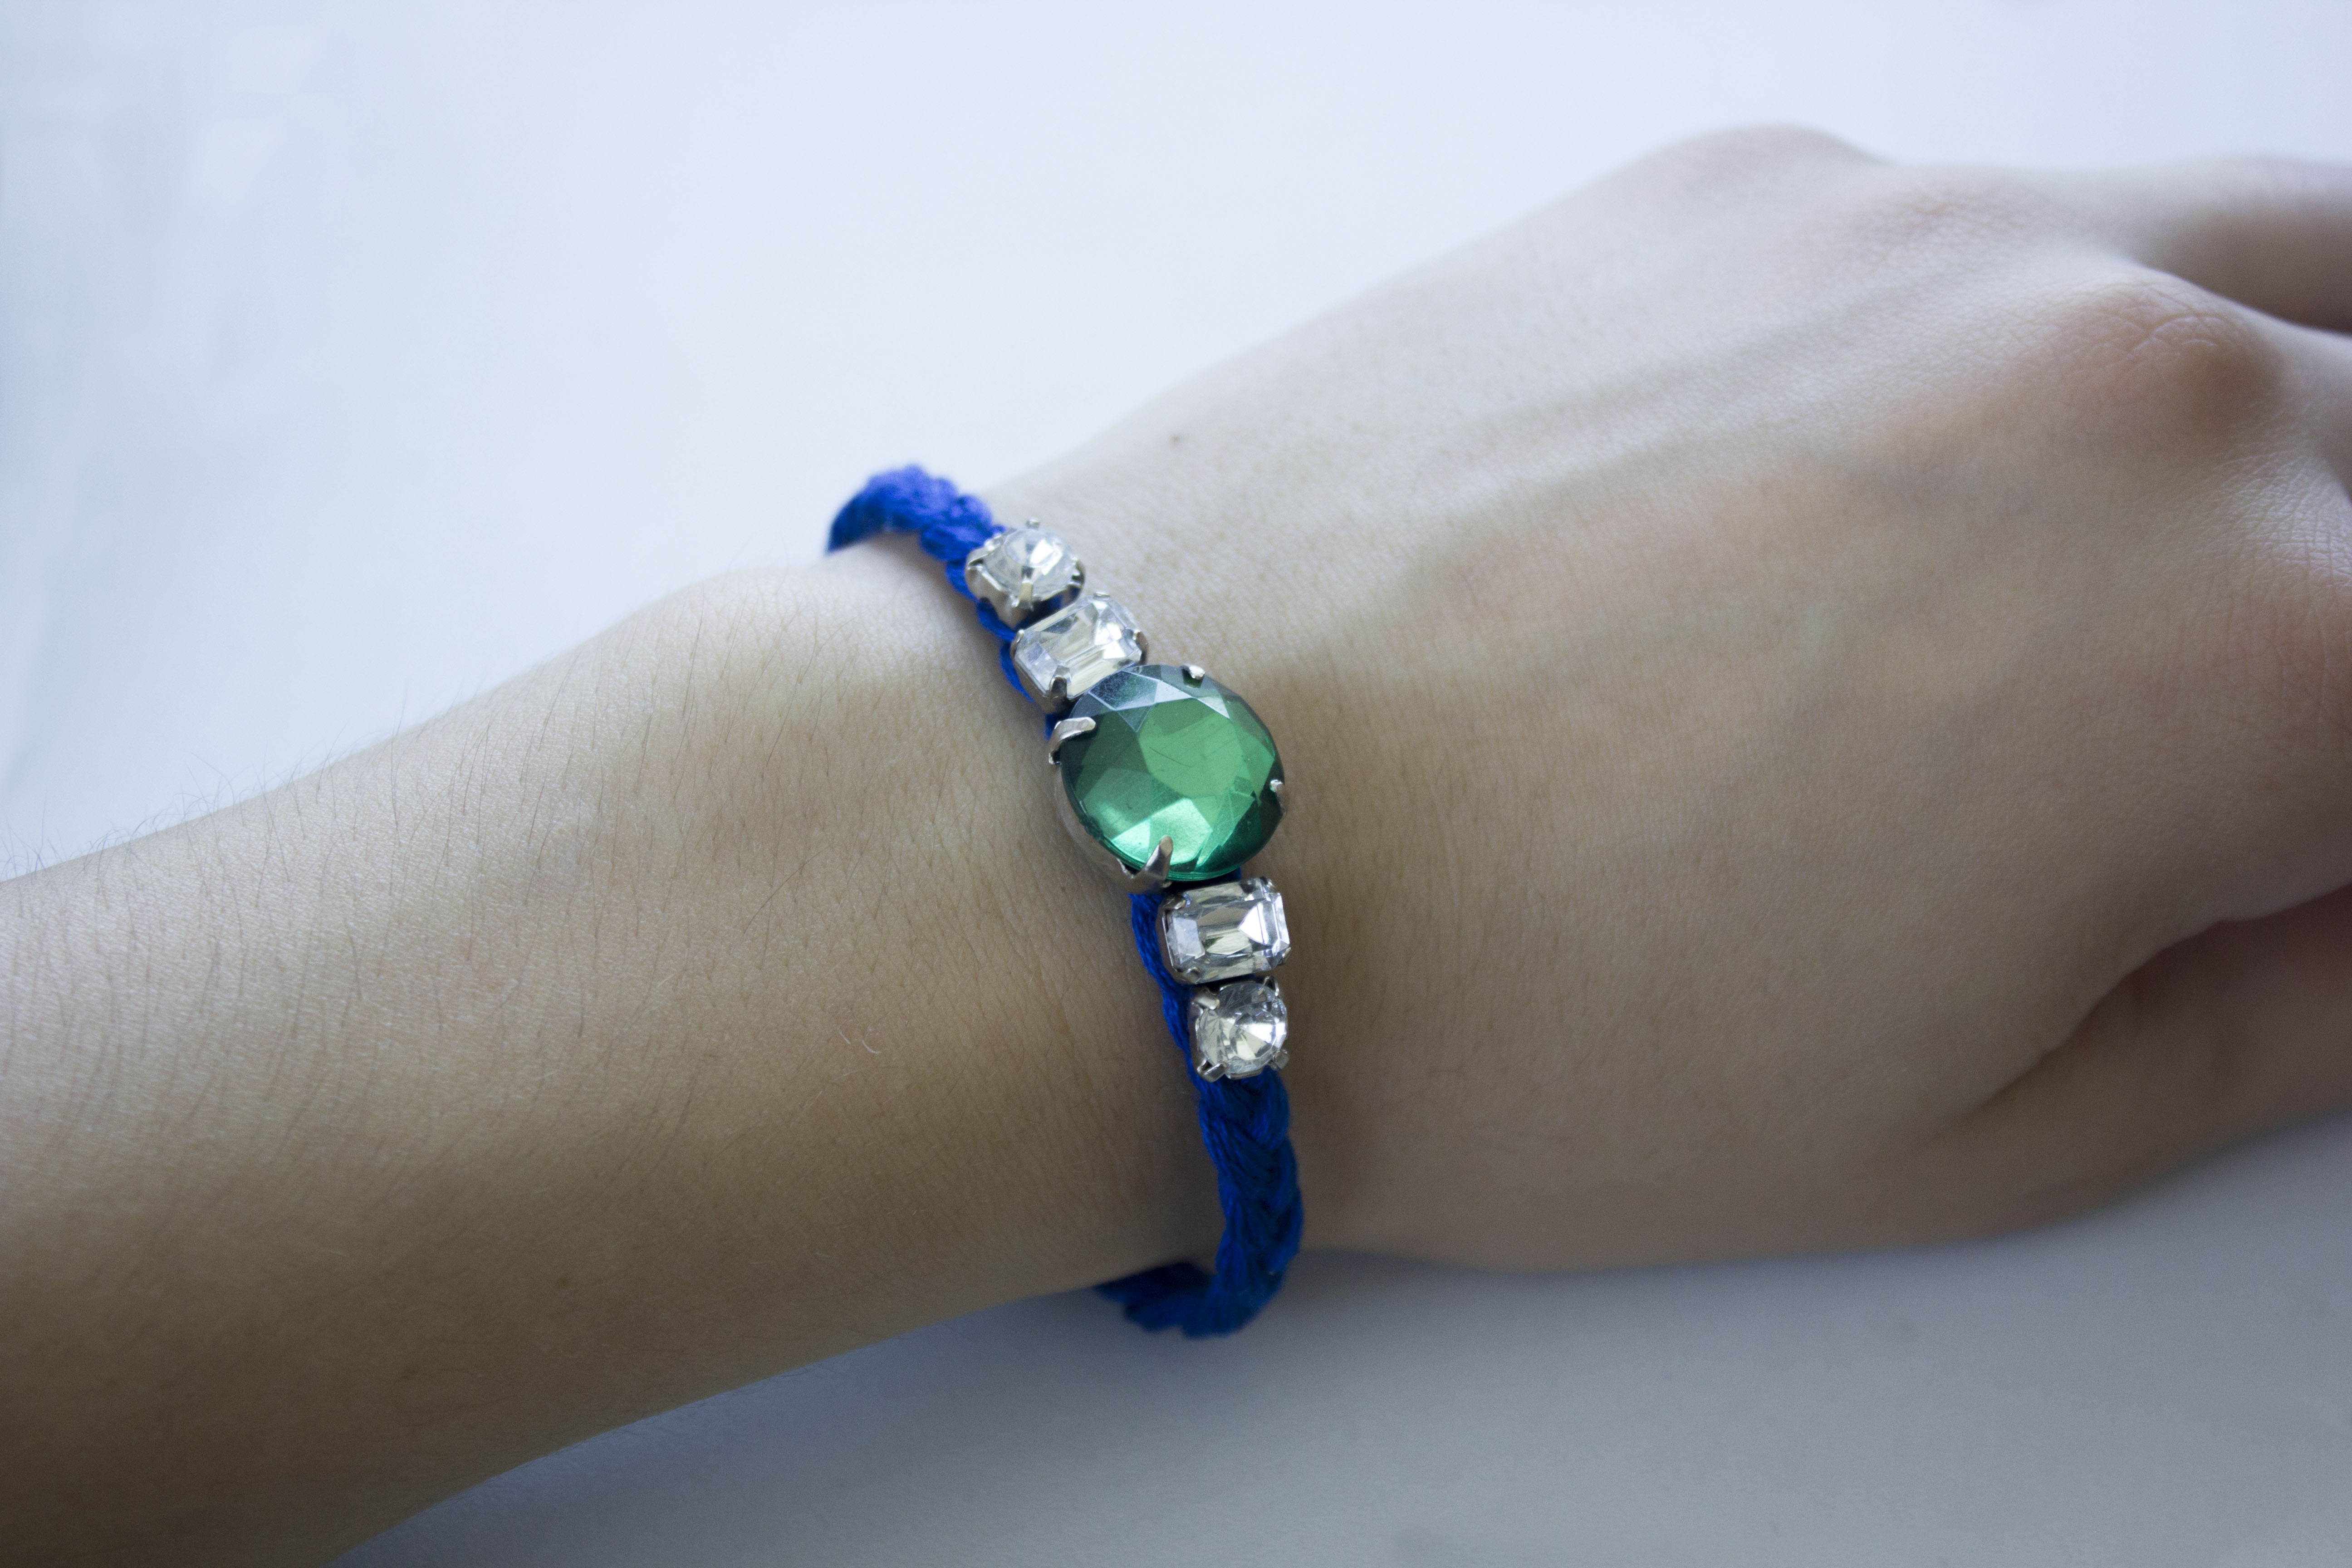 Diy friendship bracelet with name